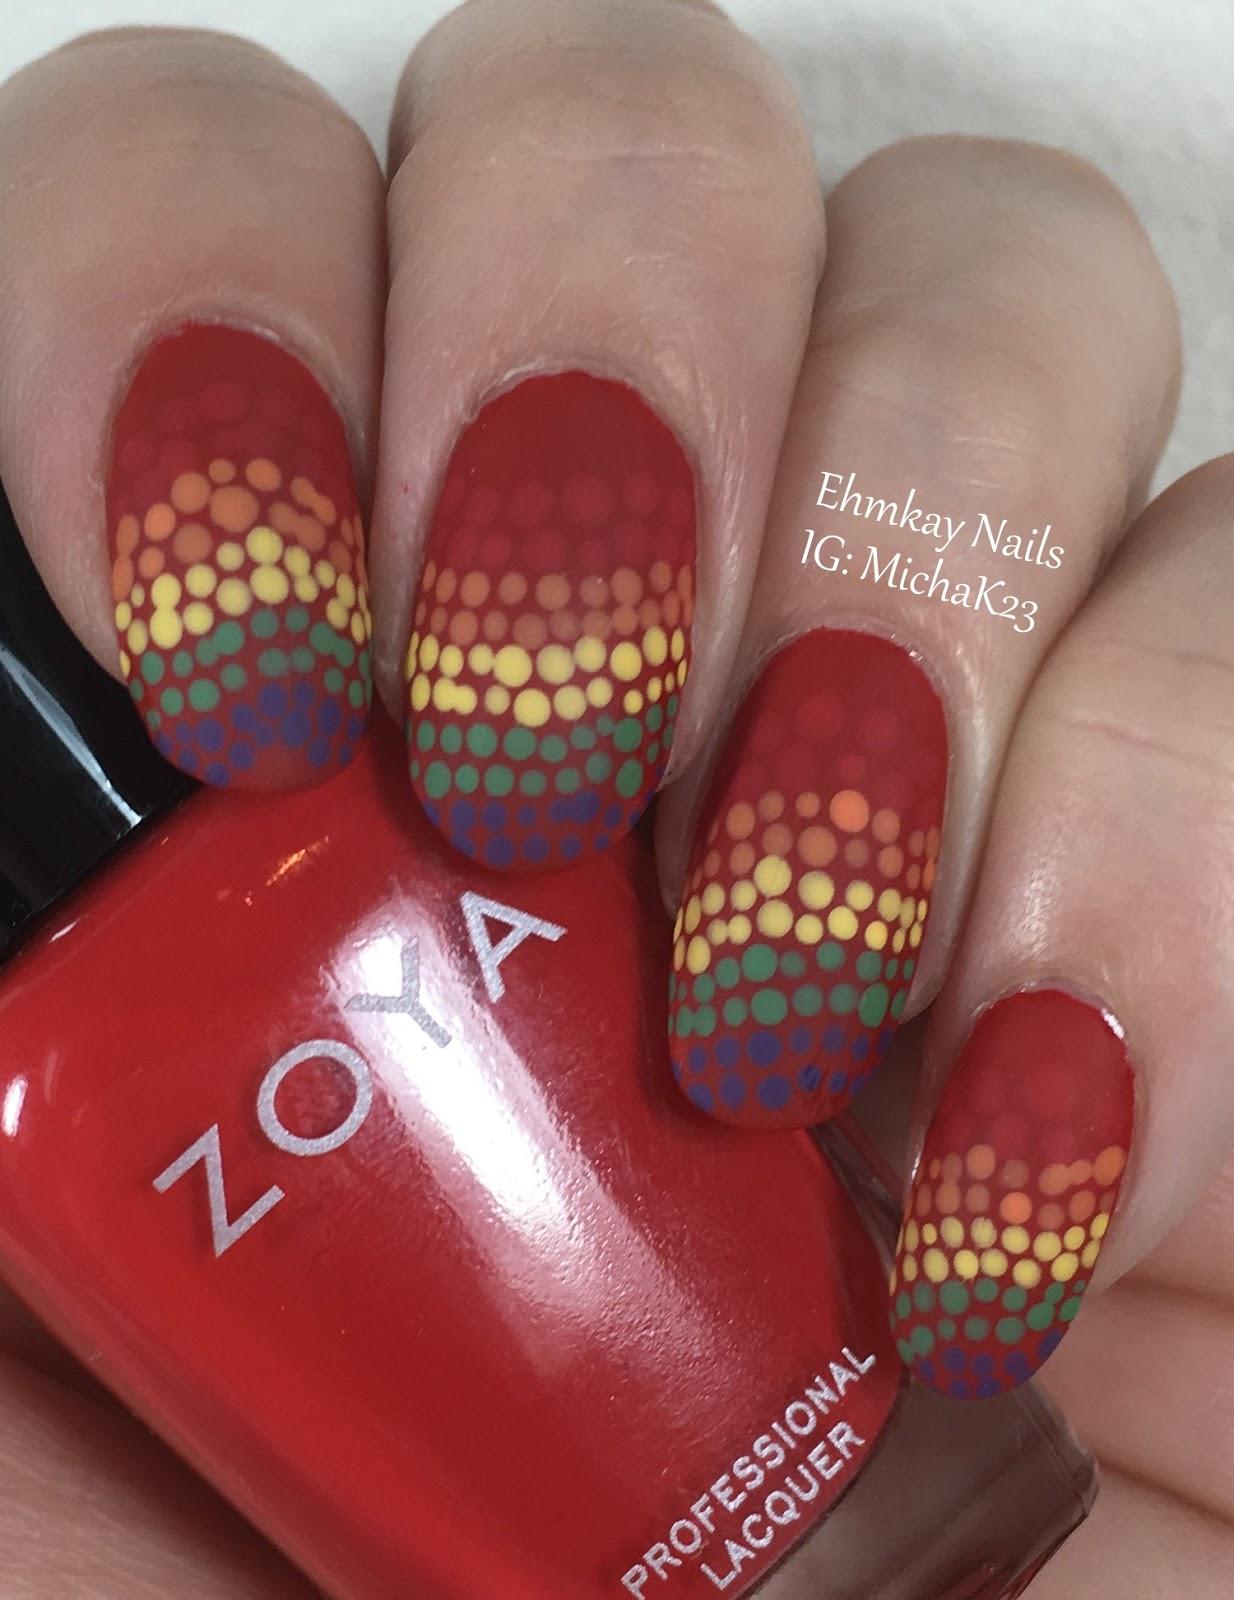 Ehmkay Nails New Year S Eve Nail Art With Kbshimmer Bling: Ehmkay Nails: Taste The Rainbow: Skittles Nail Art